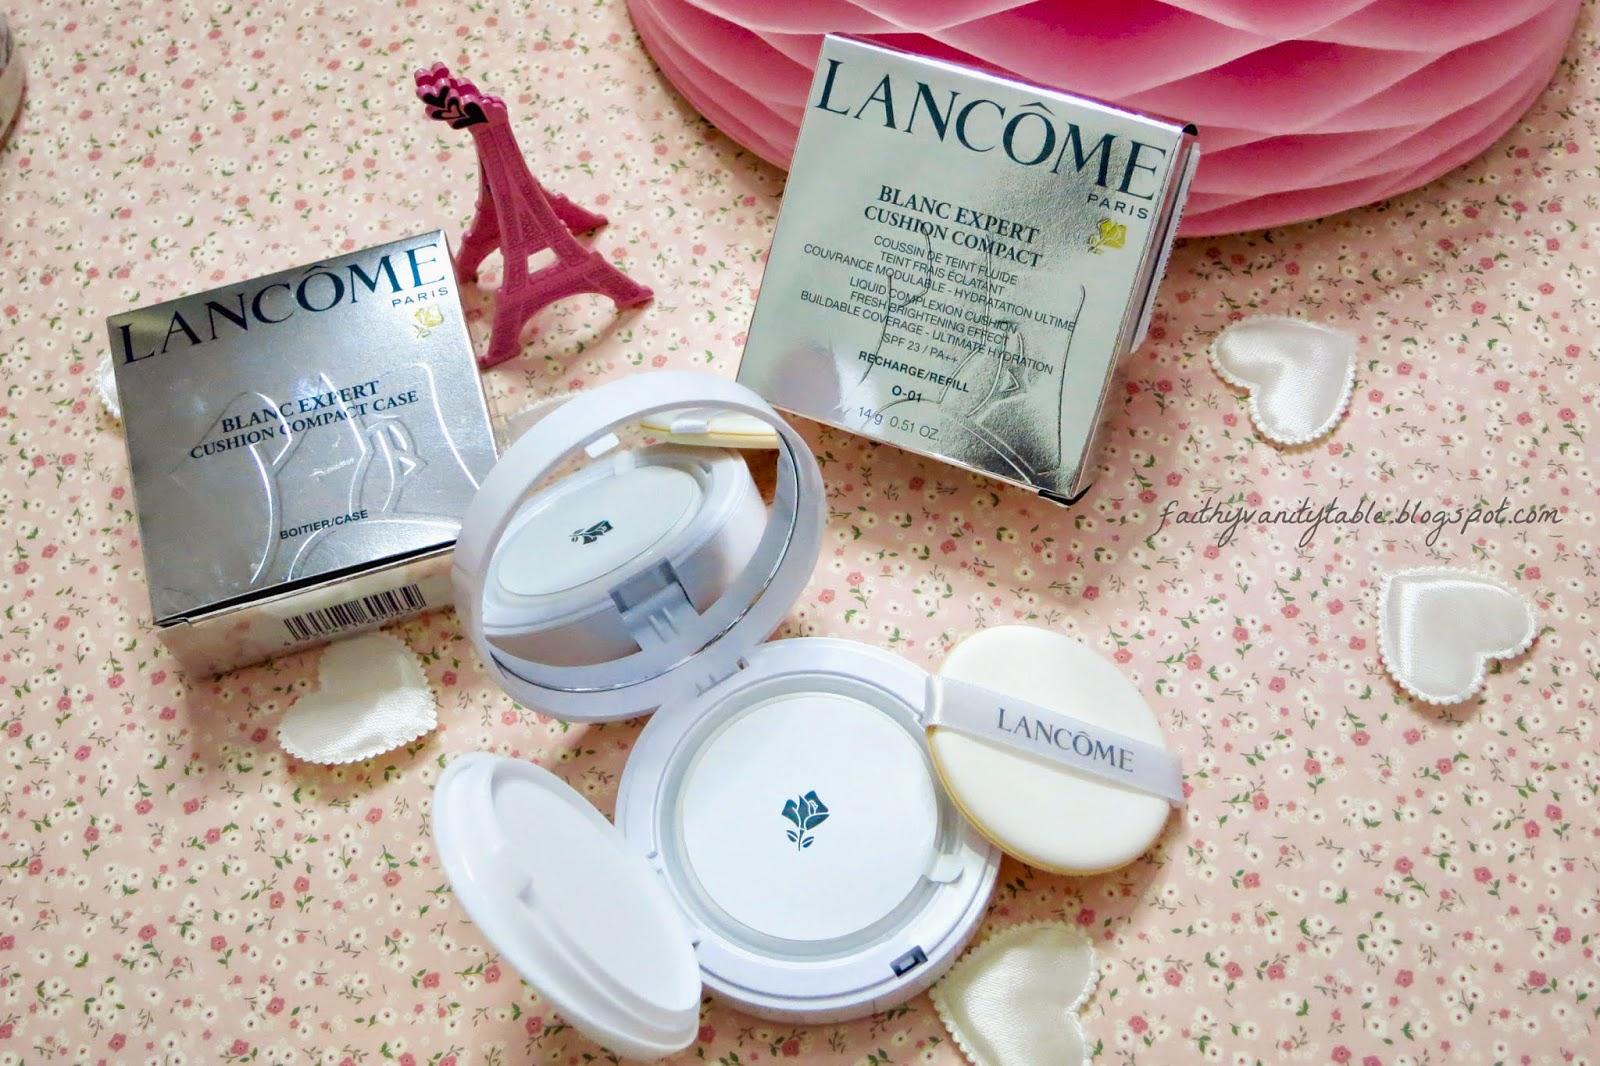 Review of Lancome Blanc Expert Cushion UV